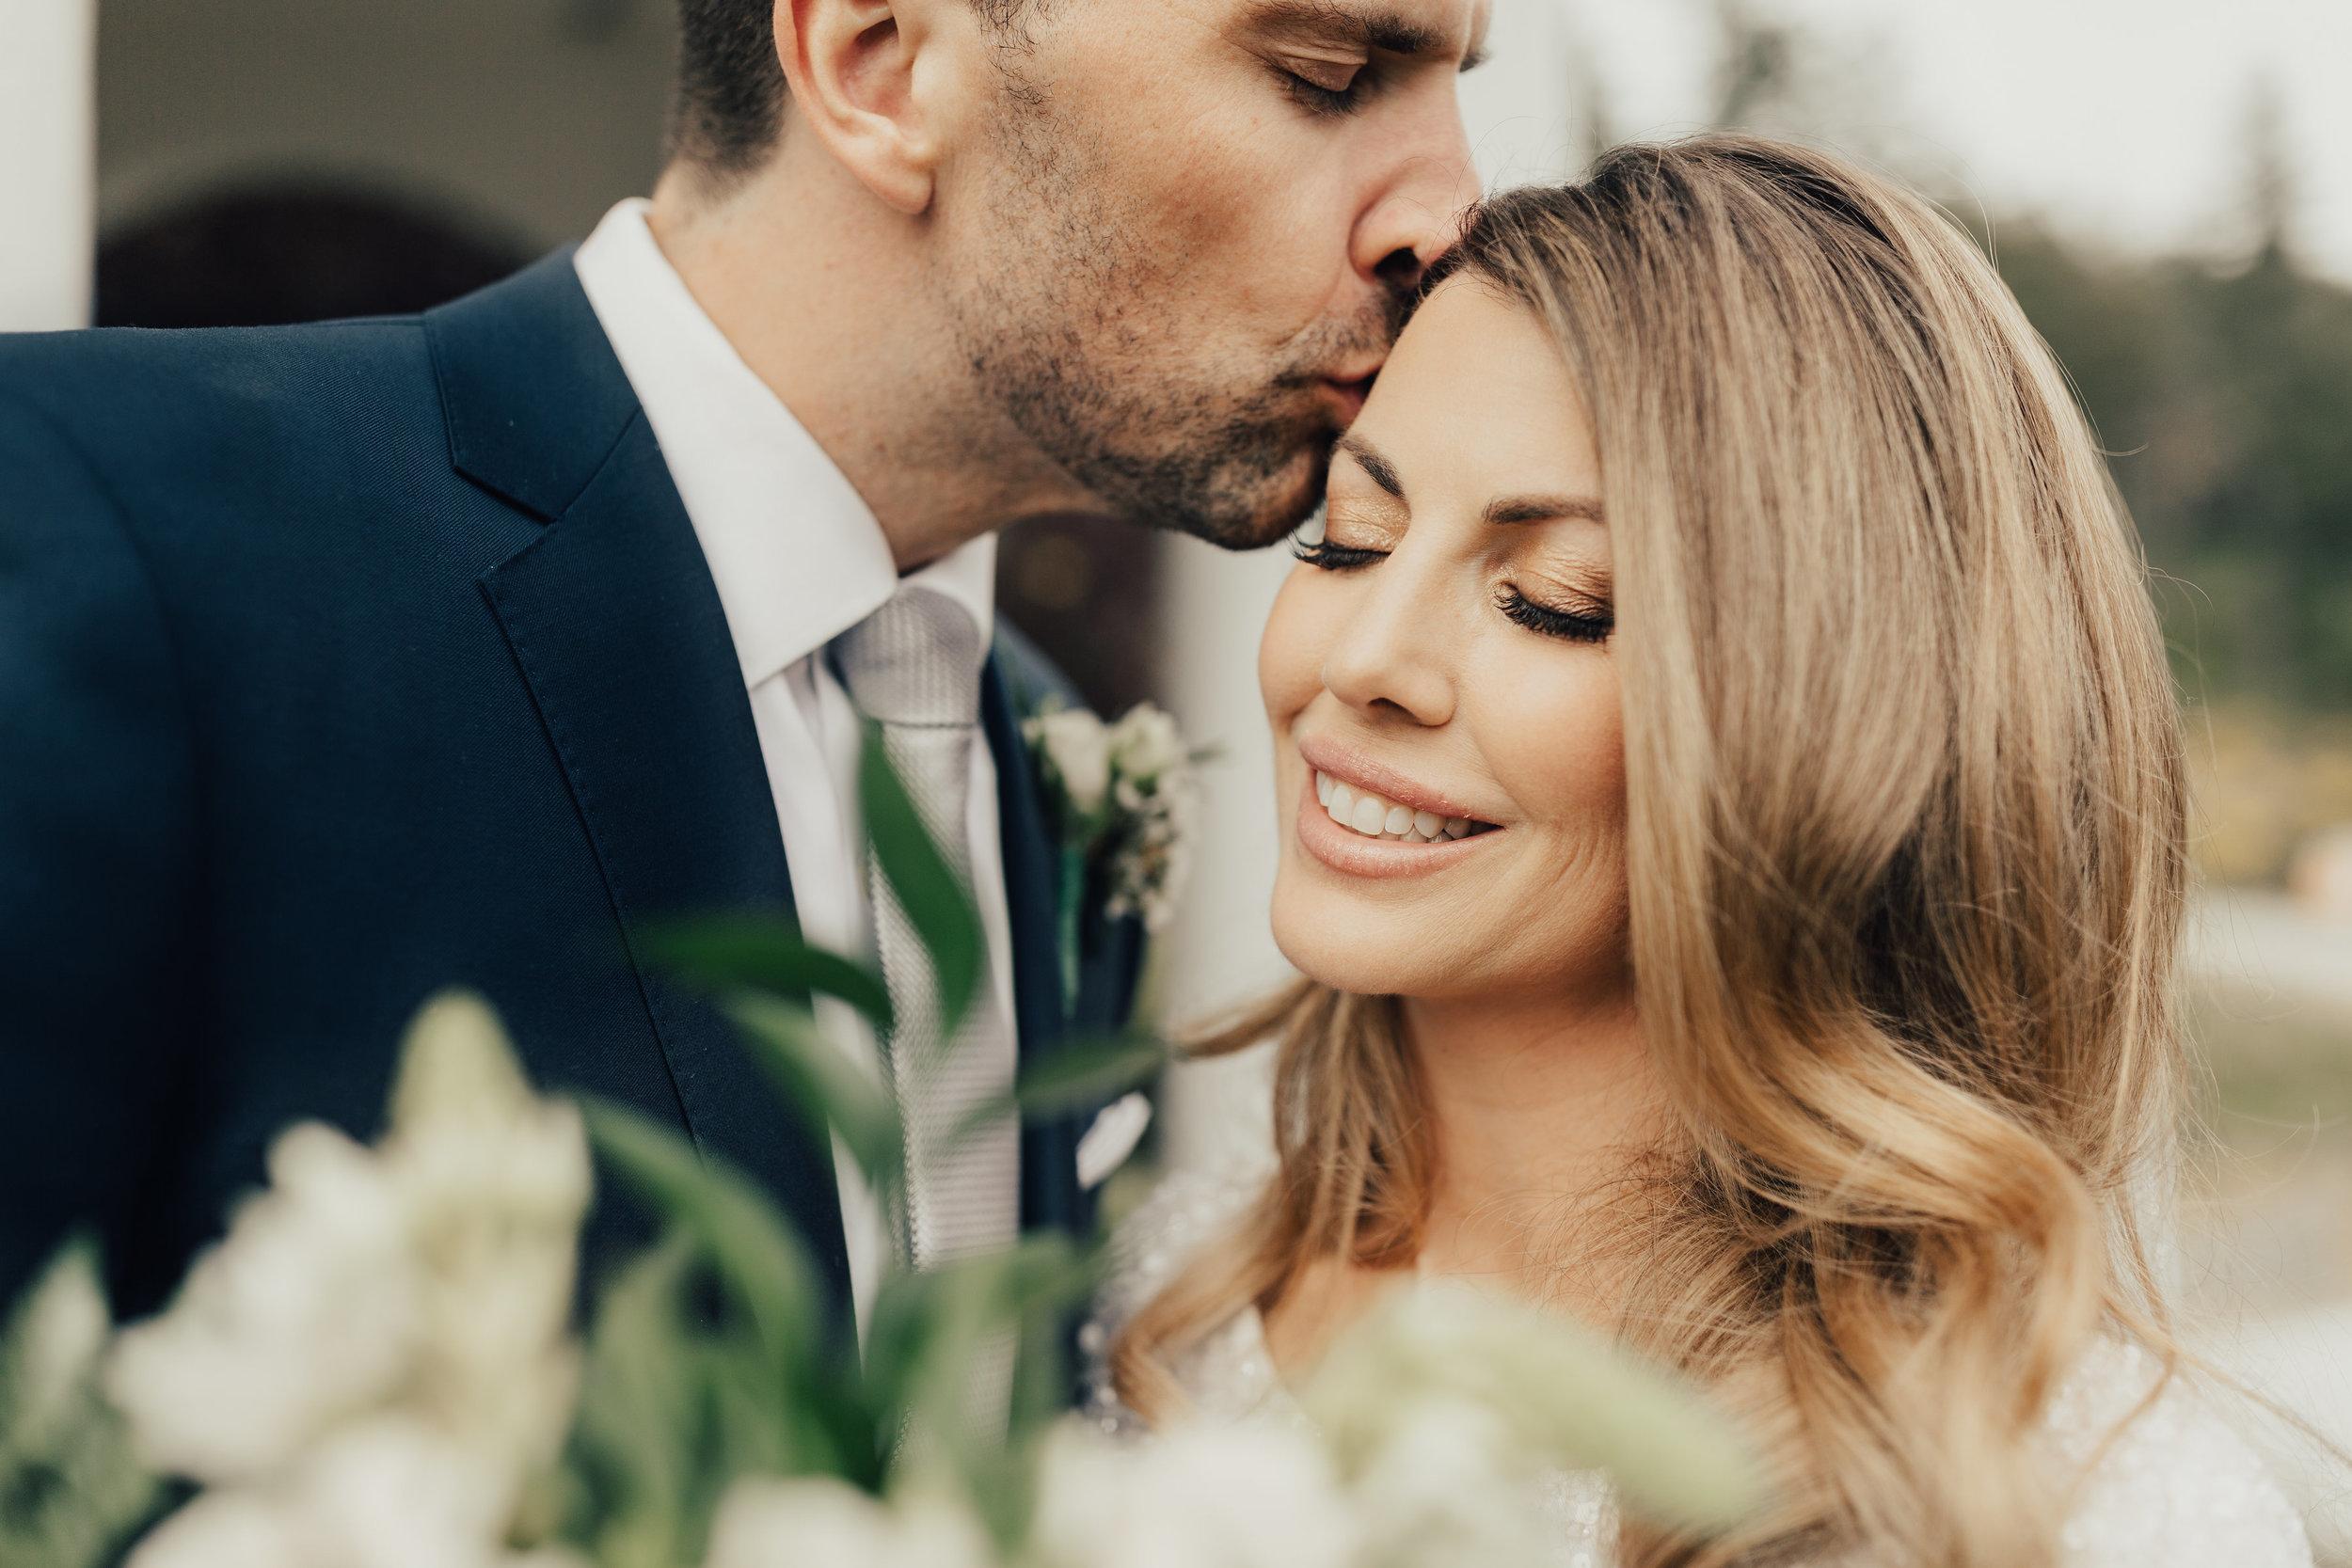 Kristine.Mike.Booth.Wedding.AGphotos-164 copy.jpg